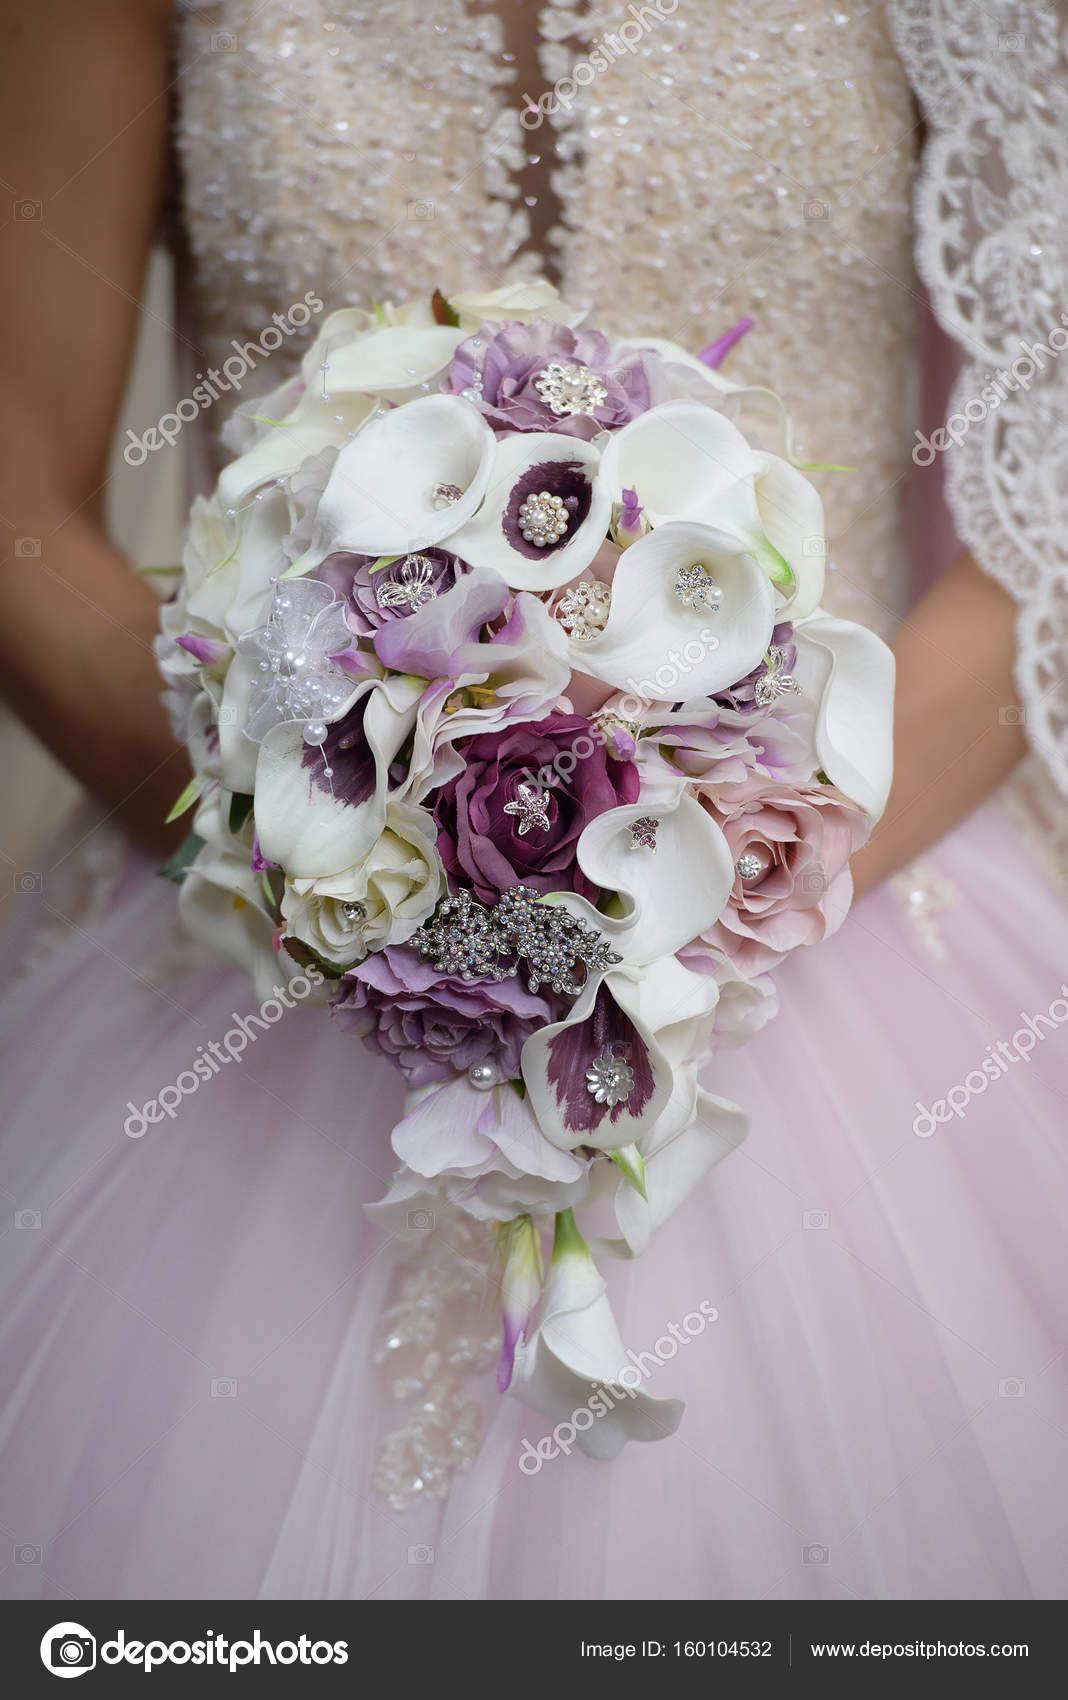 Pictures Purple Lily Bridal Bouquet Bride Holding Wedding